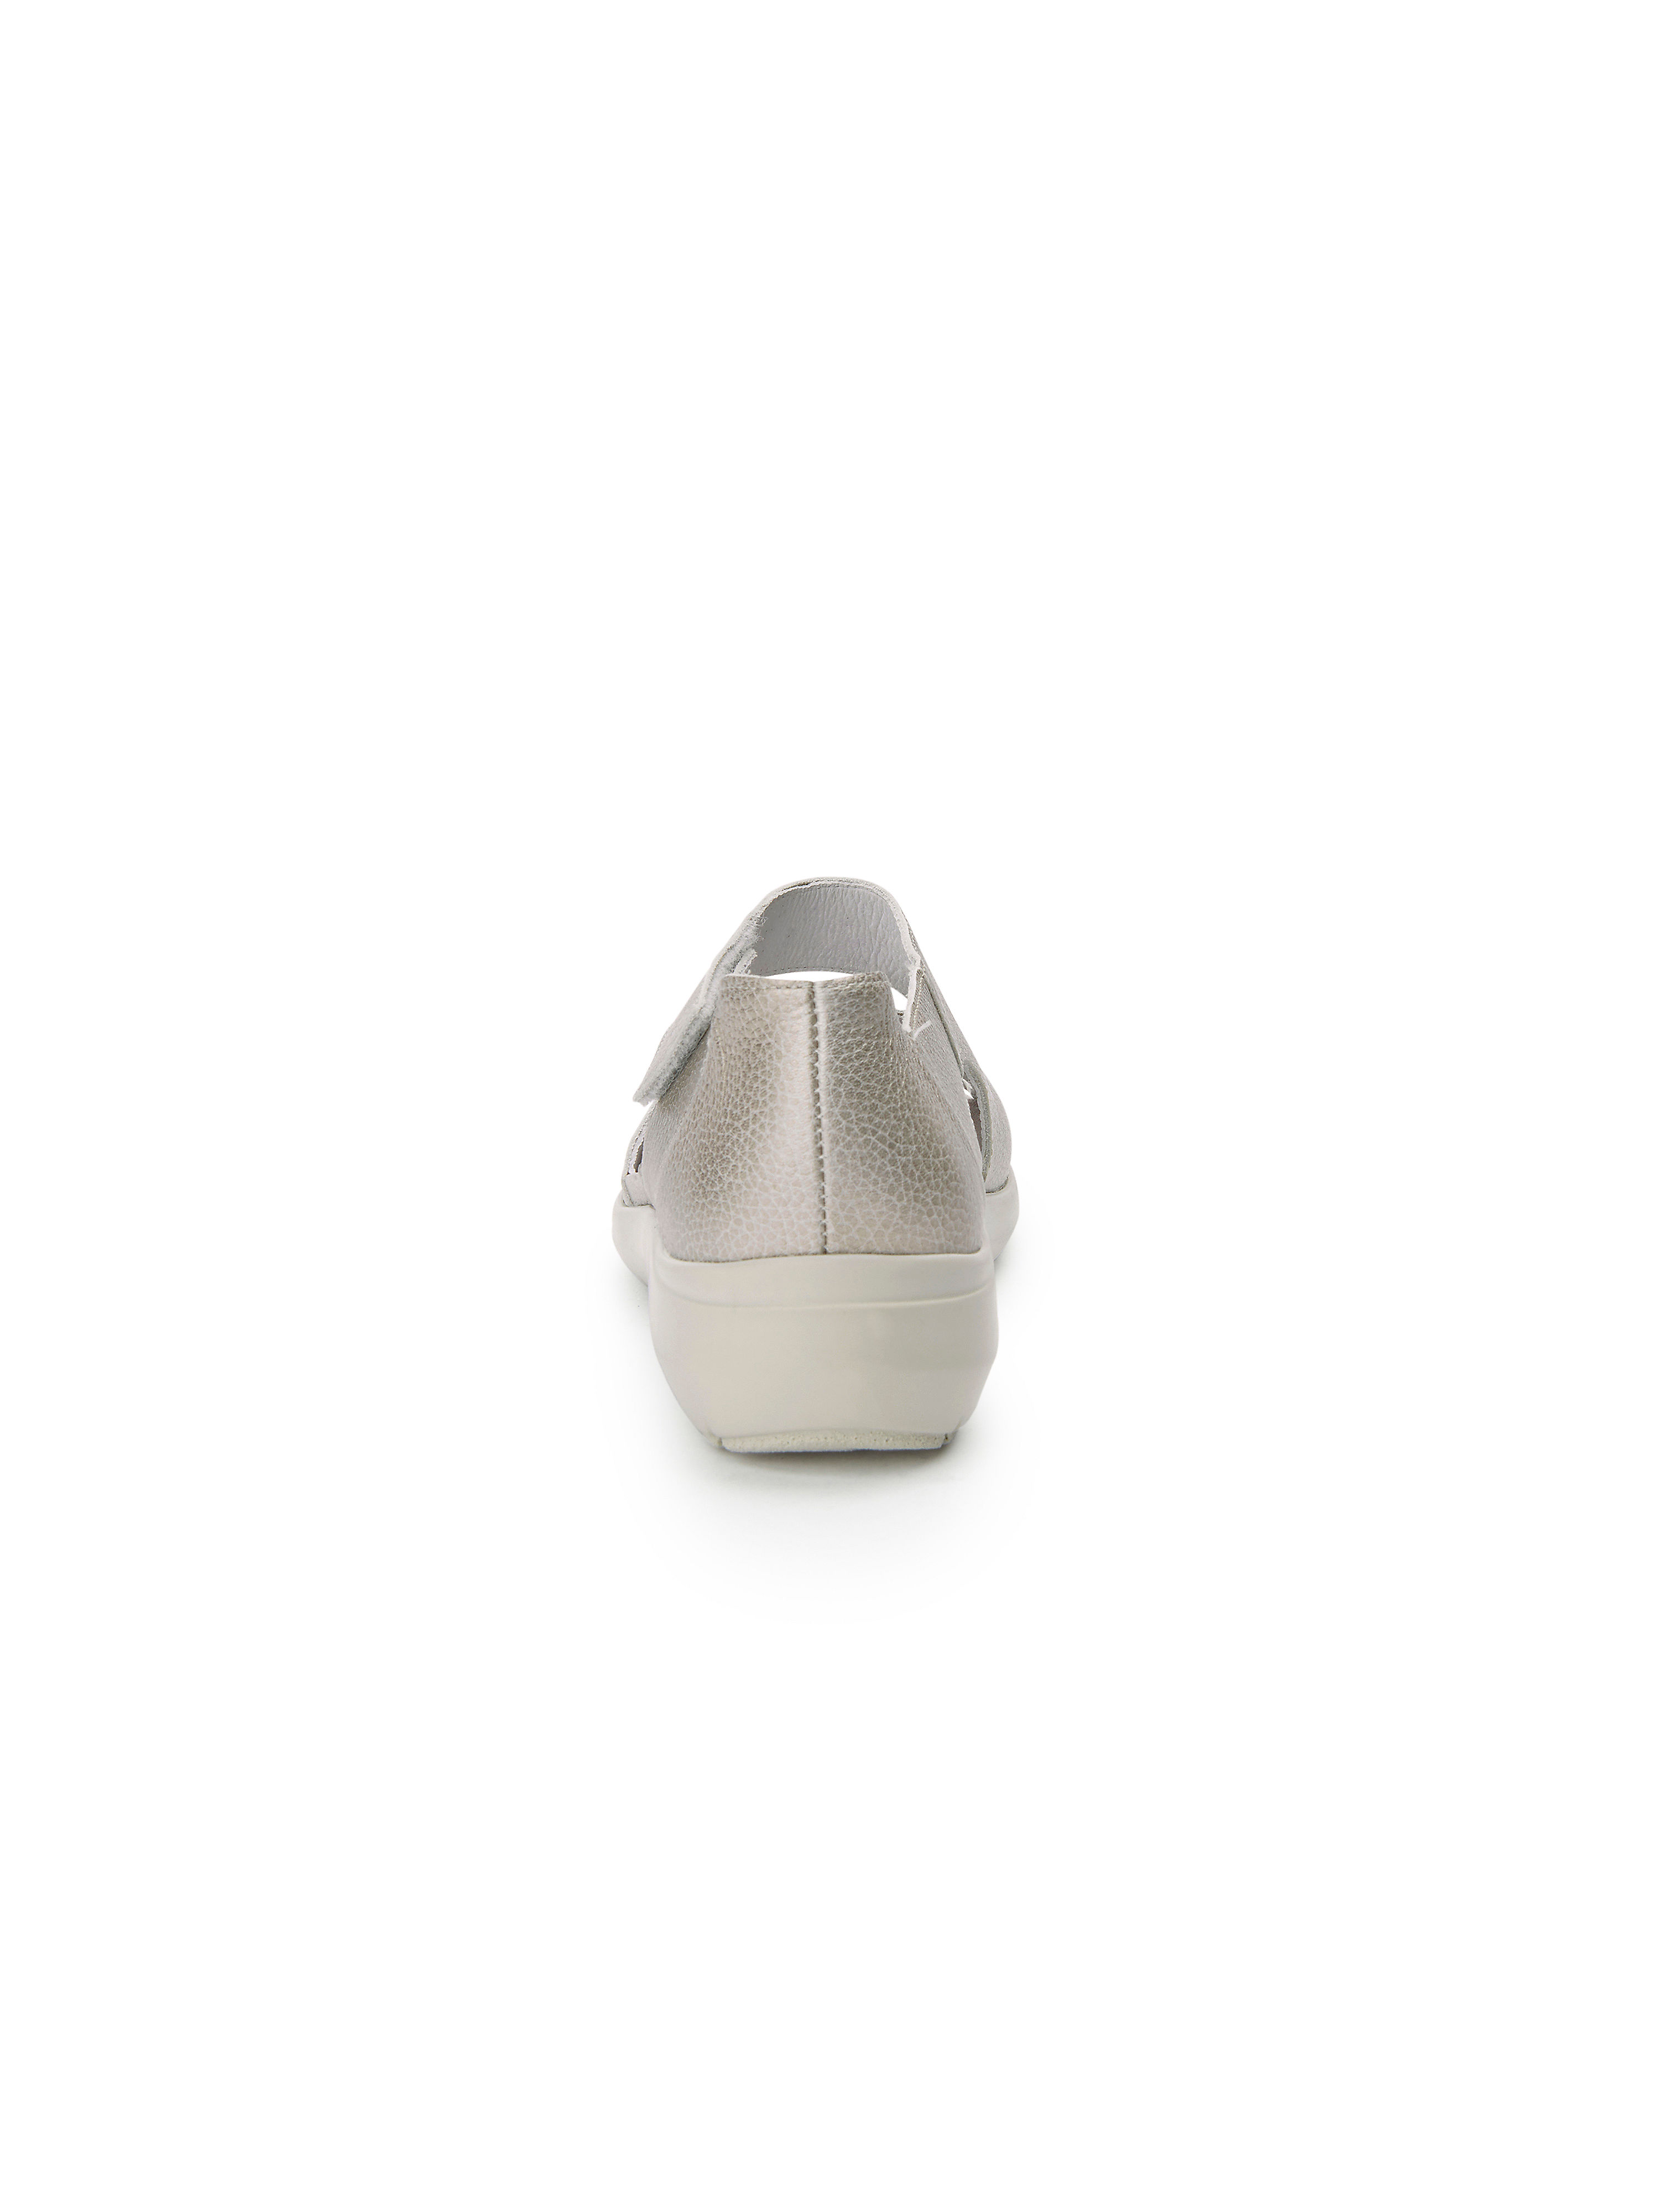 Semler - Sandale Brigitte aus 100% Leder - Schuhe Silber Gute Qualität beliebte Schuhe - ed9fbe